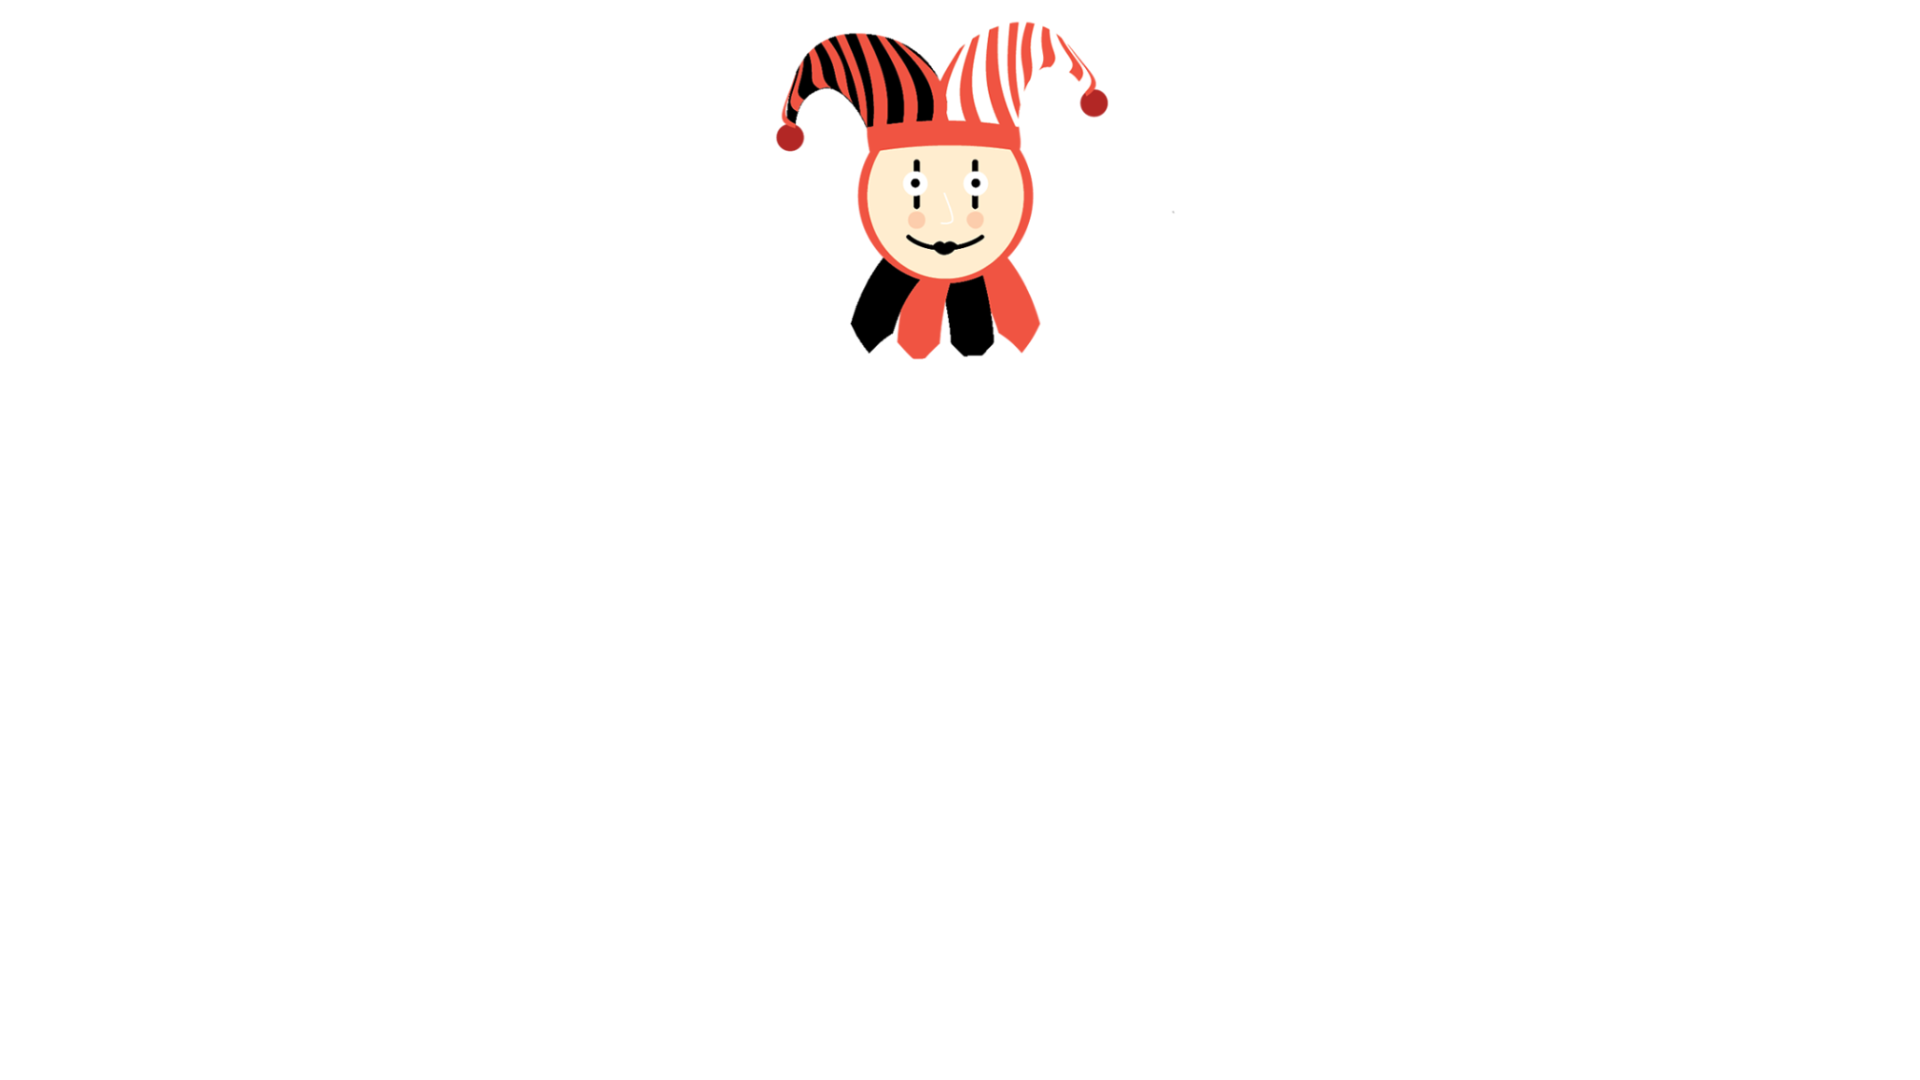 Austin Comedy Film Festival